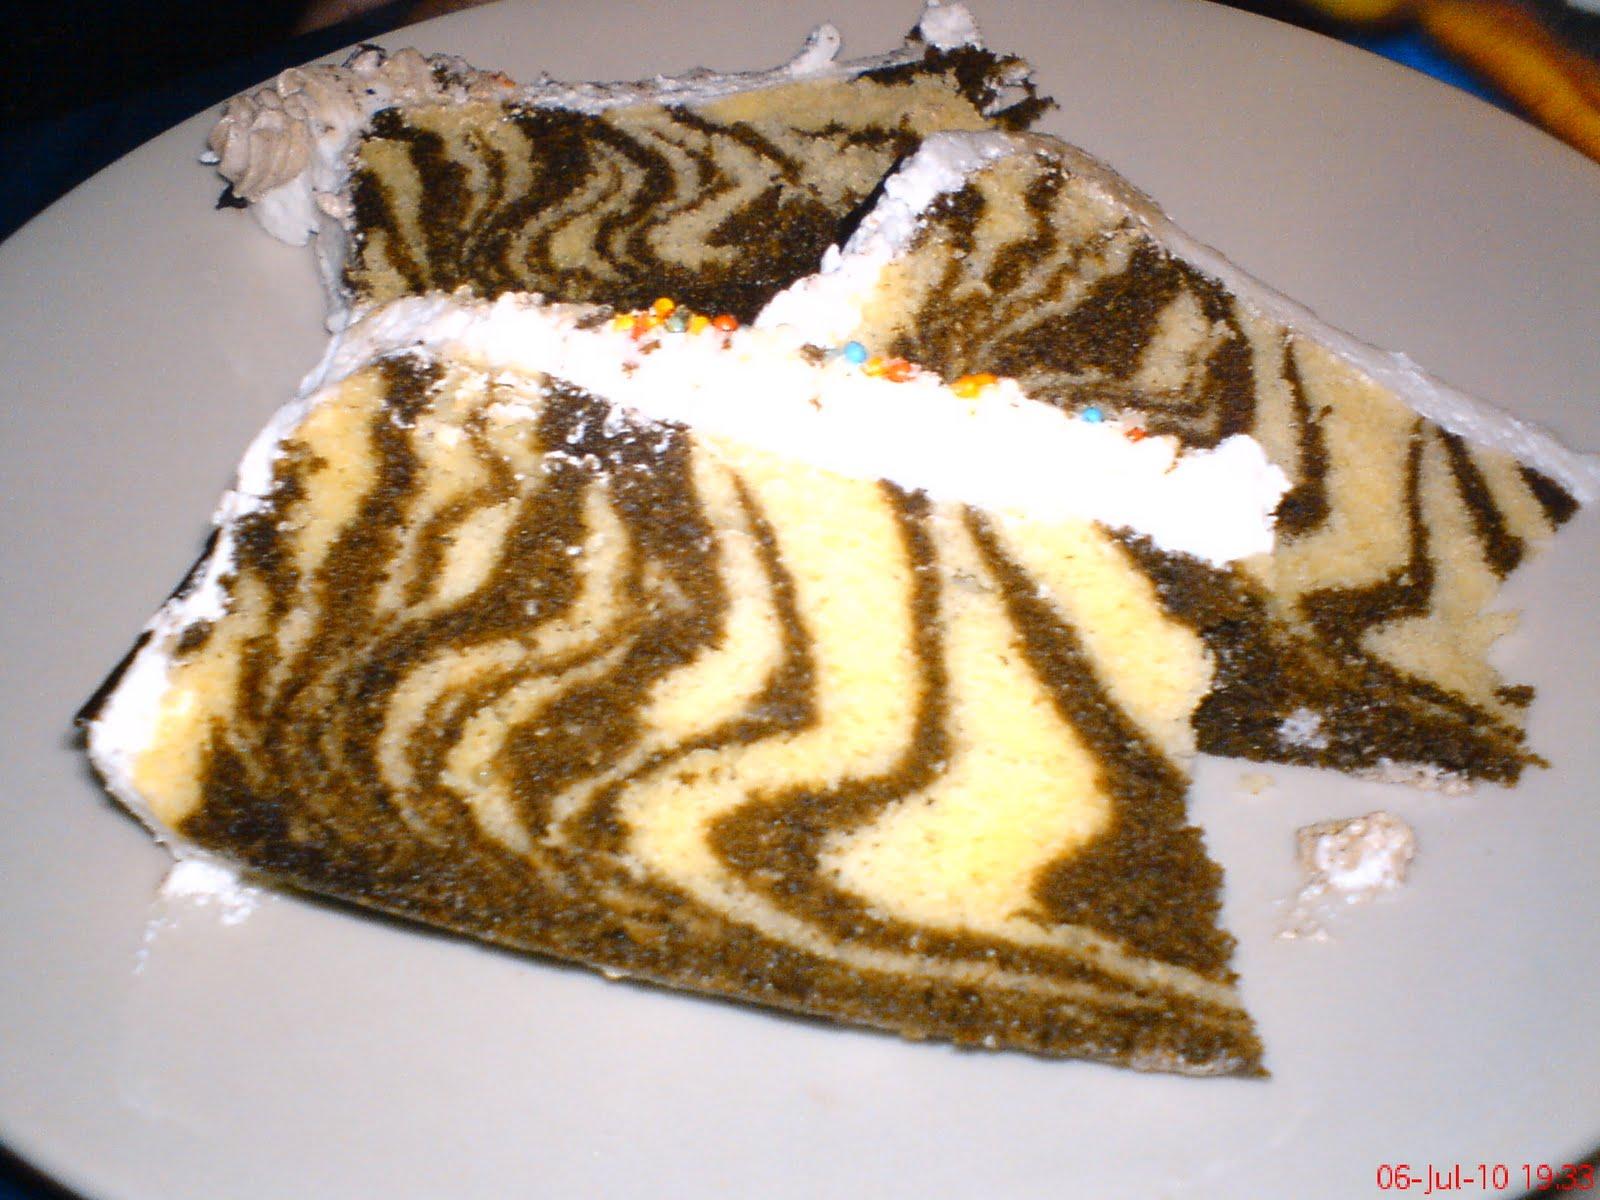 Resep Zebra Cake Kukus Ncc Enak Dan Lezat Resep Rainbow Cake Enak